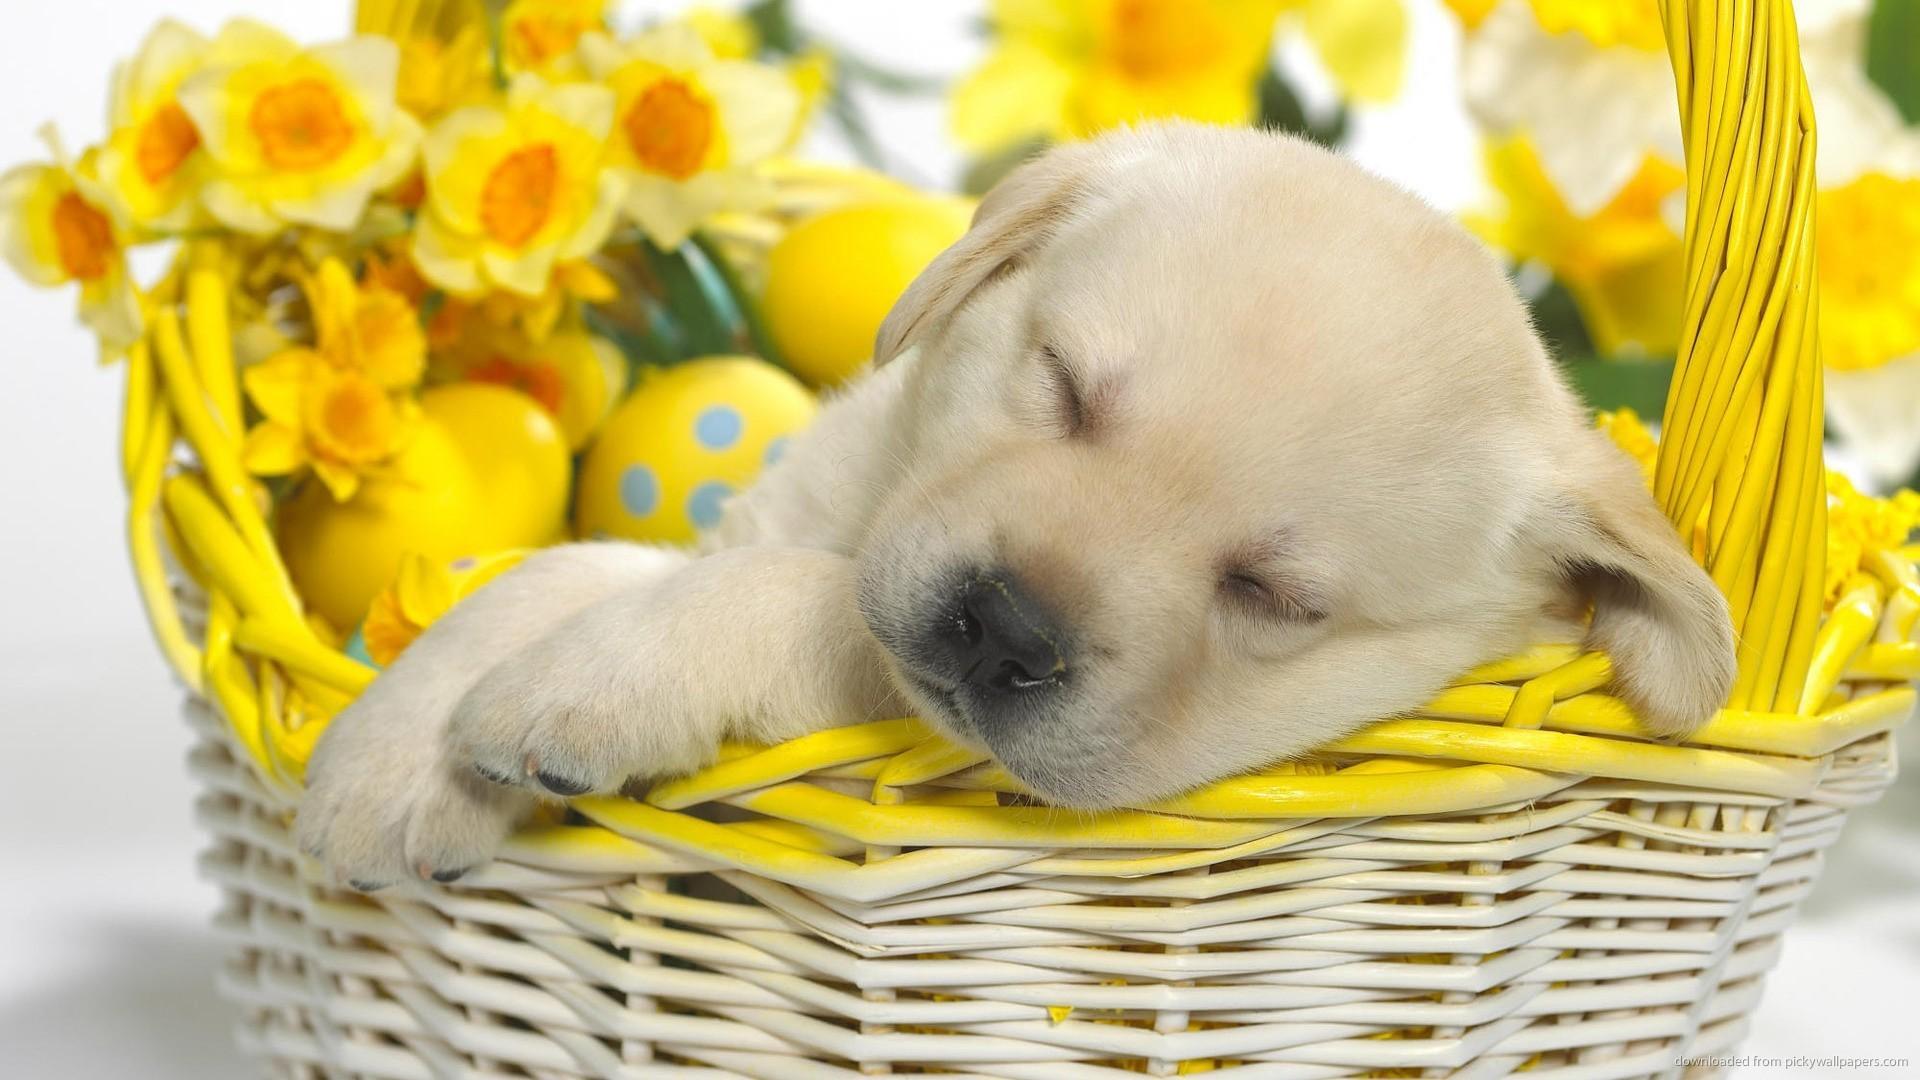 Cute Easter Basket wallpaper 1920x1080 26353 1920x1080